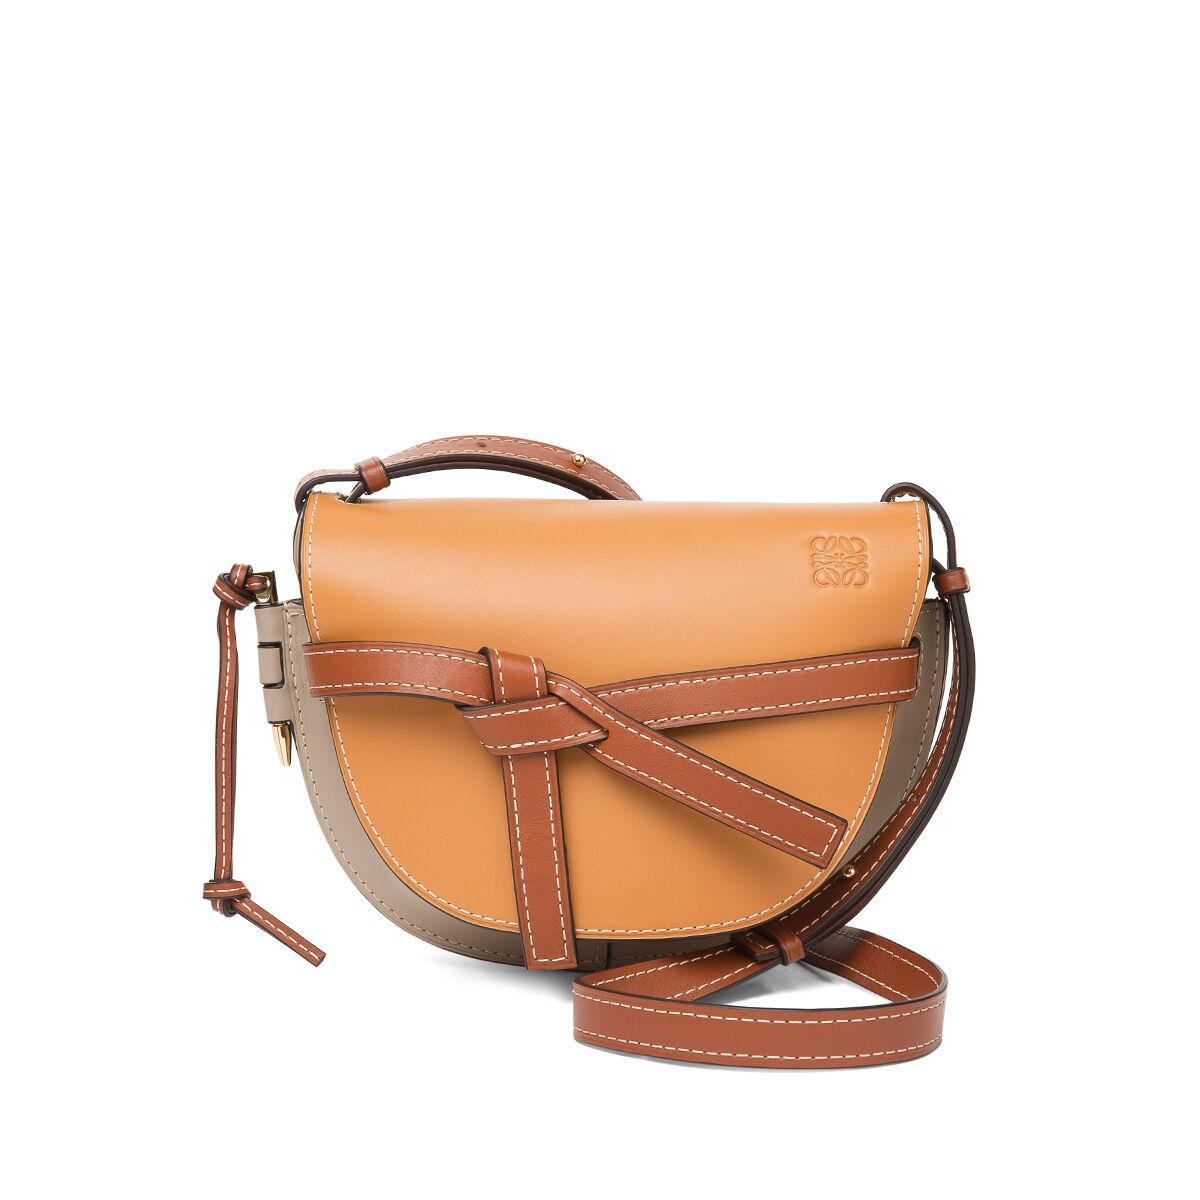 LOEWE Gate Small Bag Amber/Light Grey/Rust Colour all